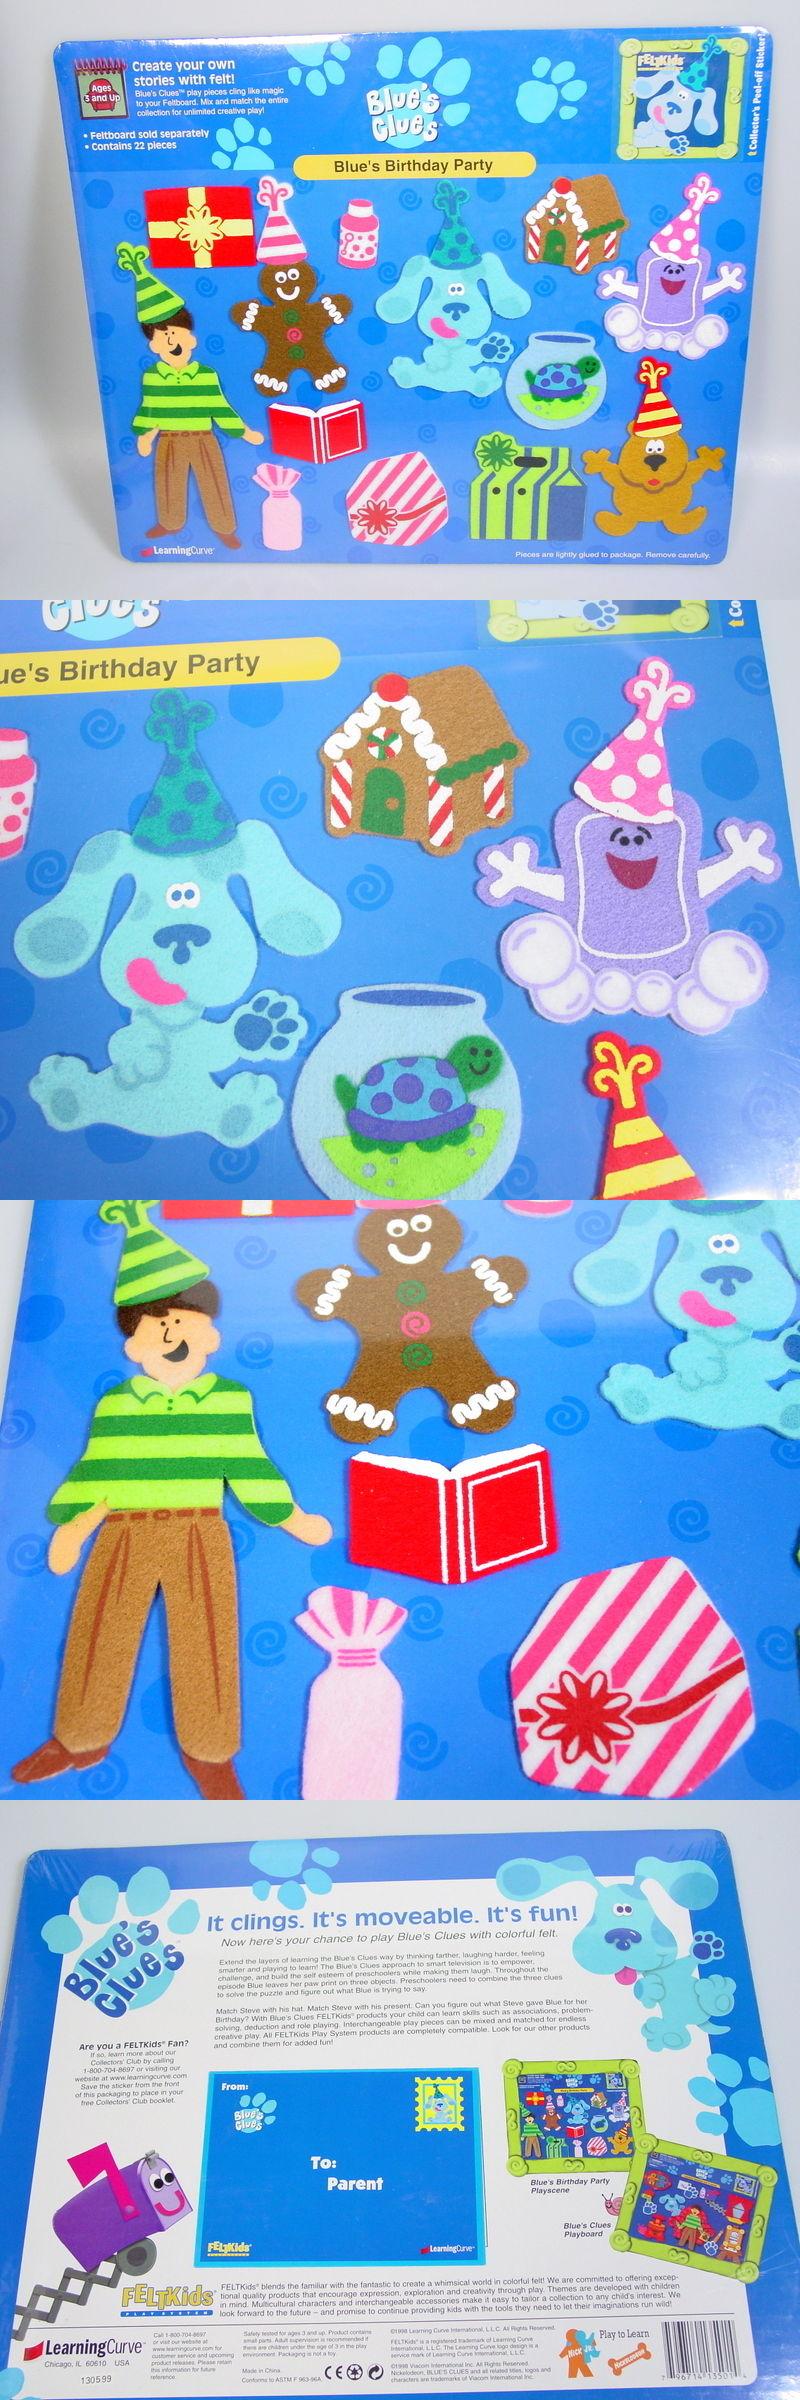 blues clues 2626 blue s clues toy birthday party felt flannel